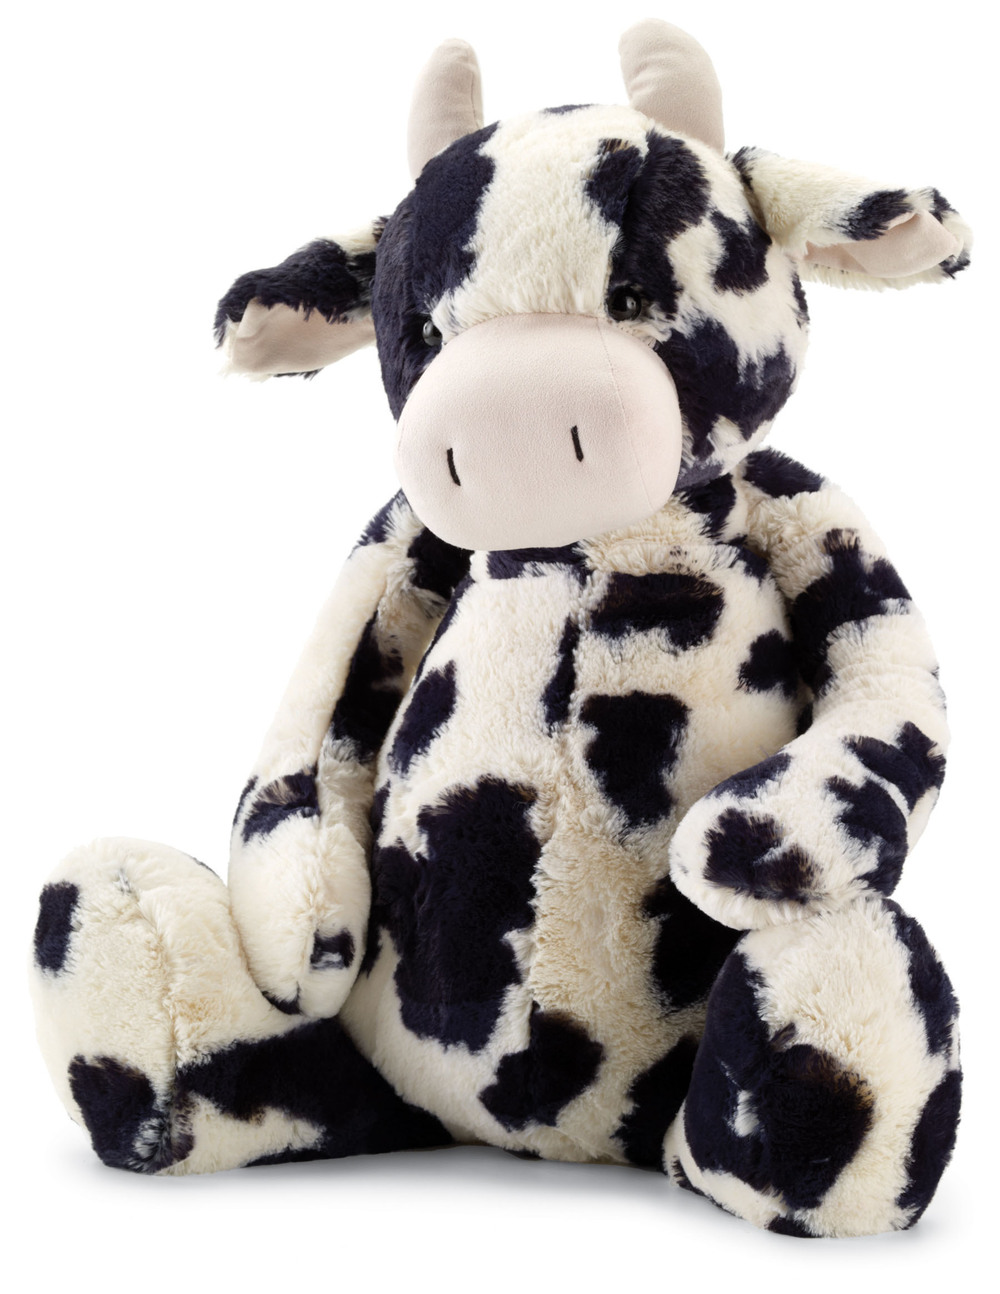 Plush Toy Cow Black White Stuffed Animal Plush Cow Buy Plush